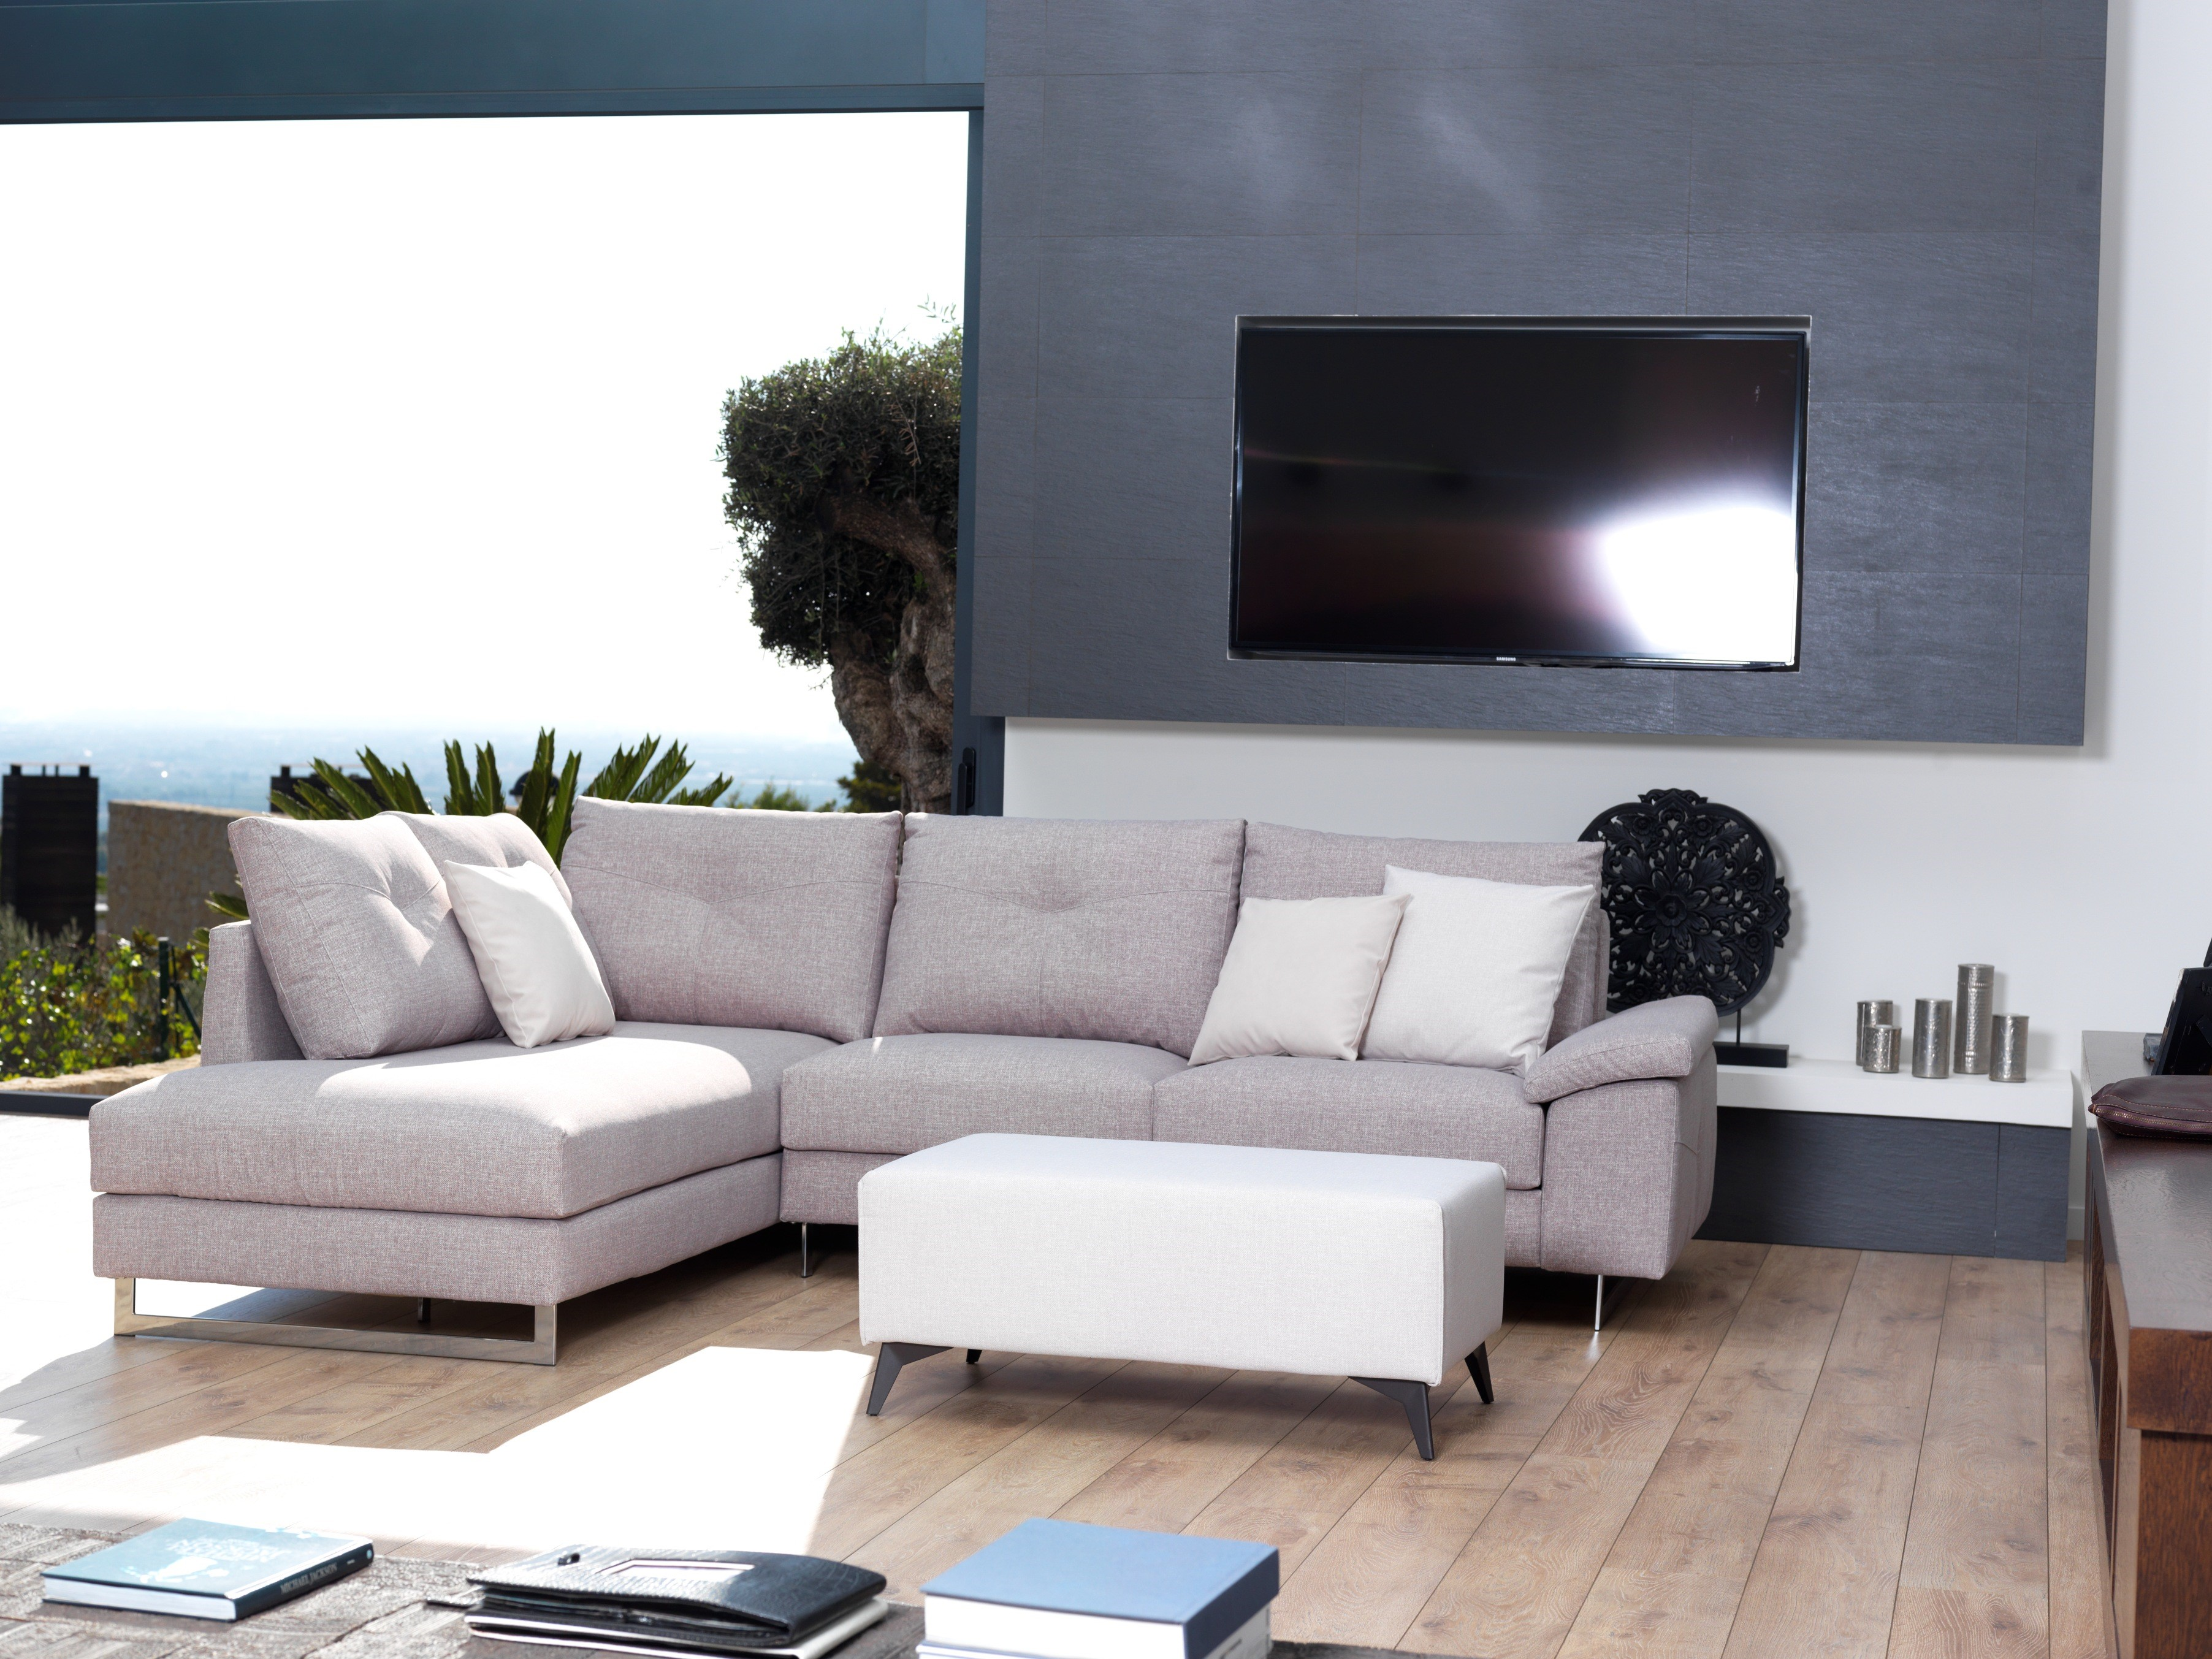 Para cada estilo de vida, un sofá